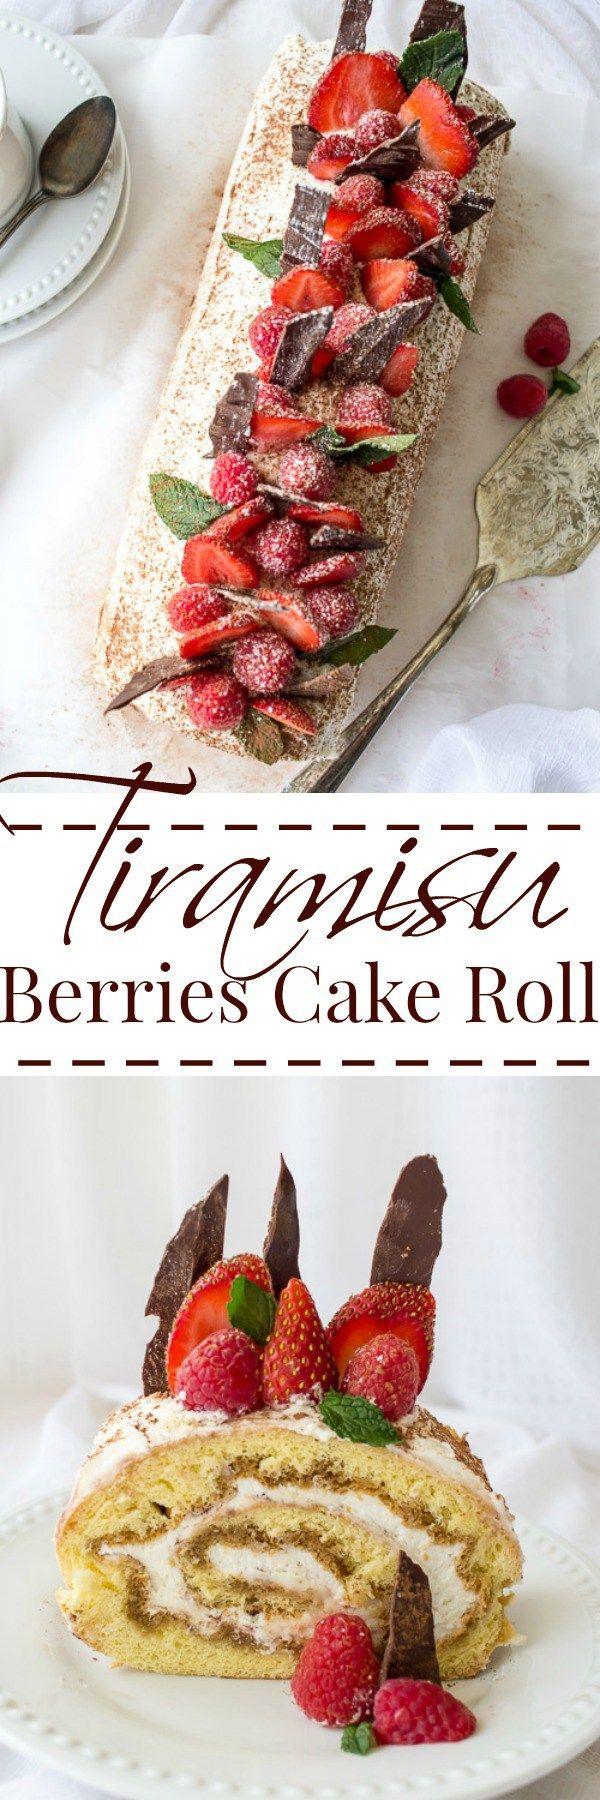 Tiramisu and Berries Cake Roll. ValentinasCorner.com